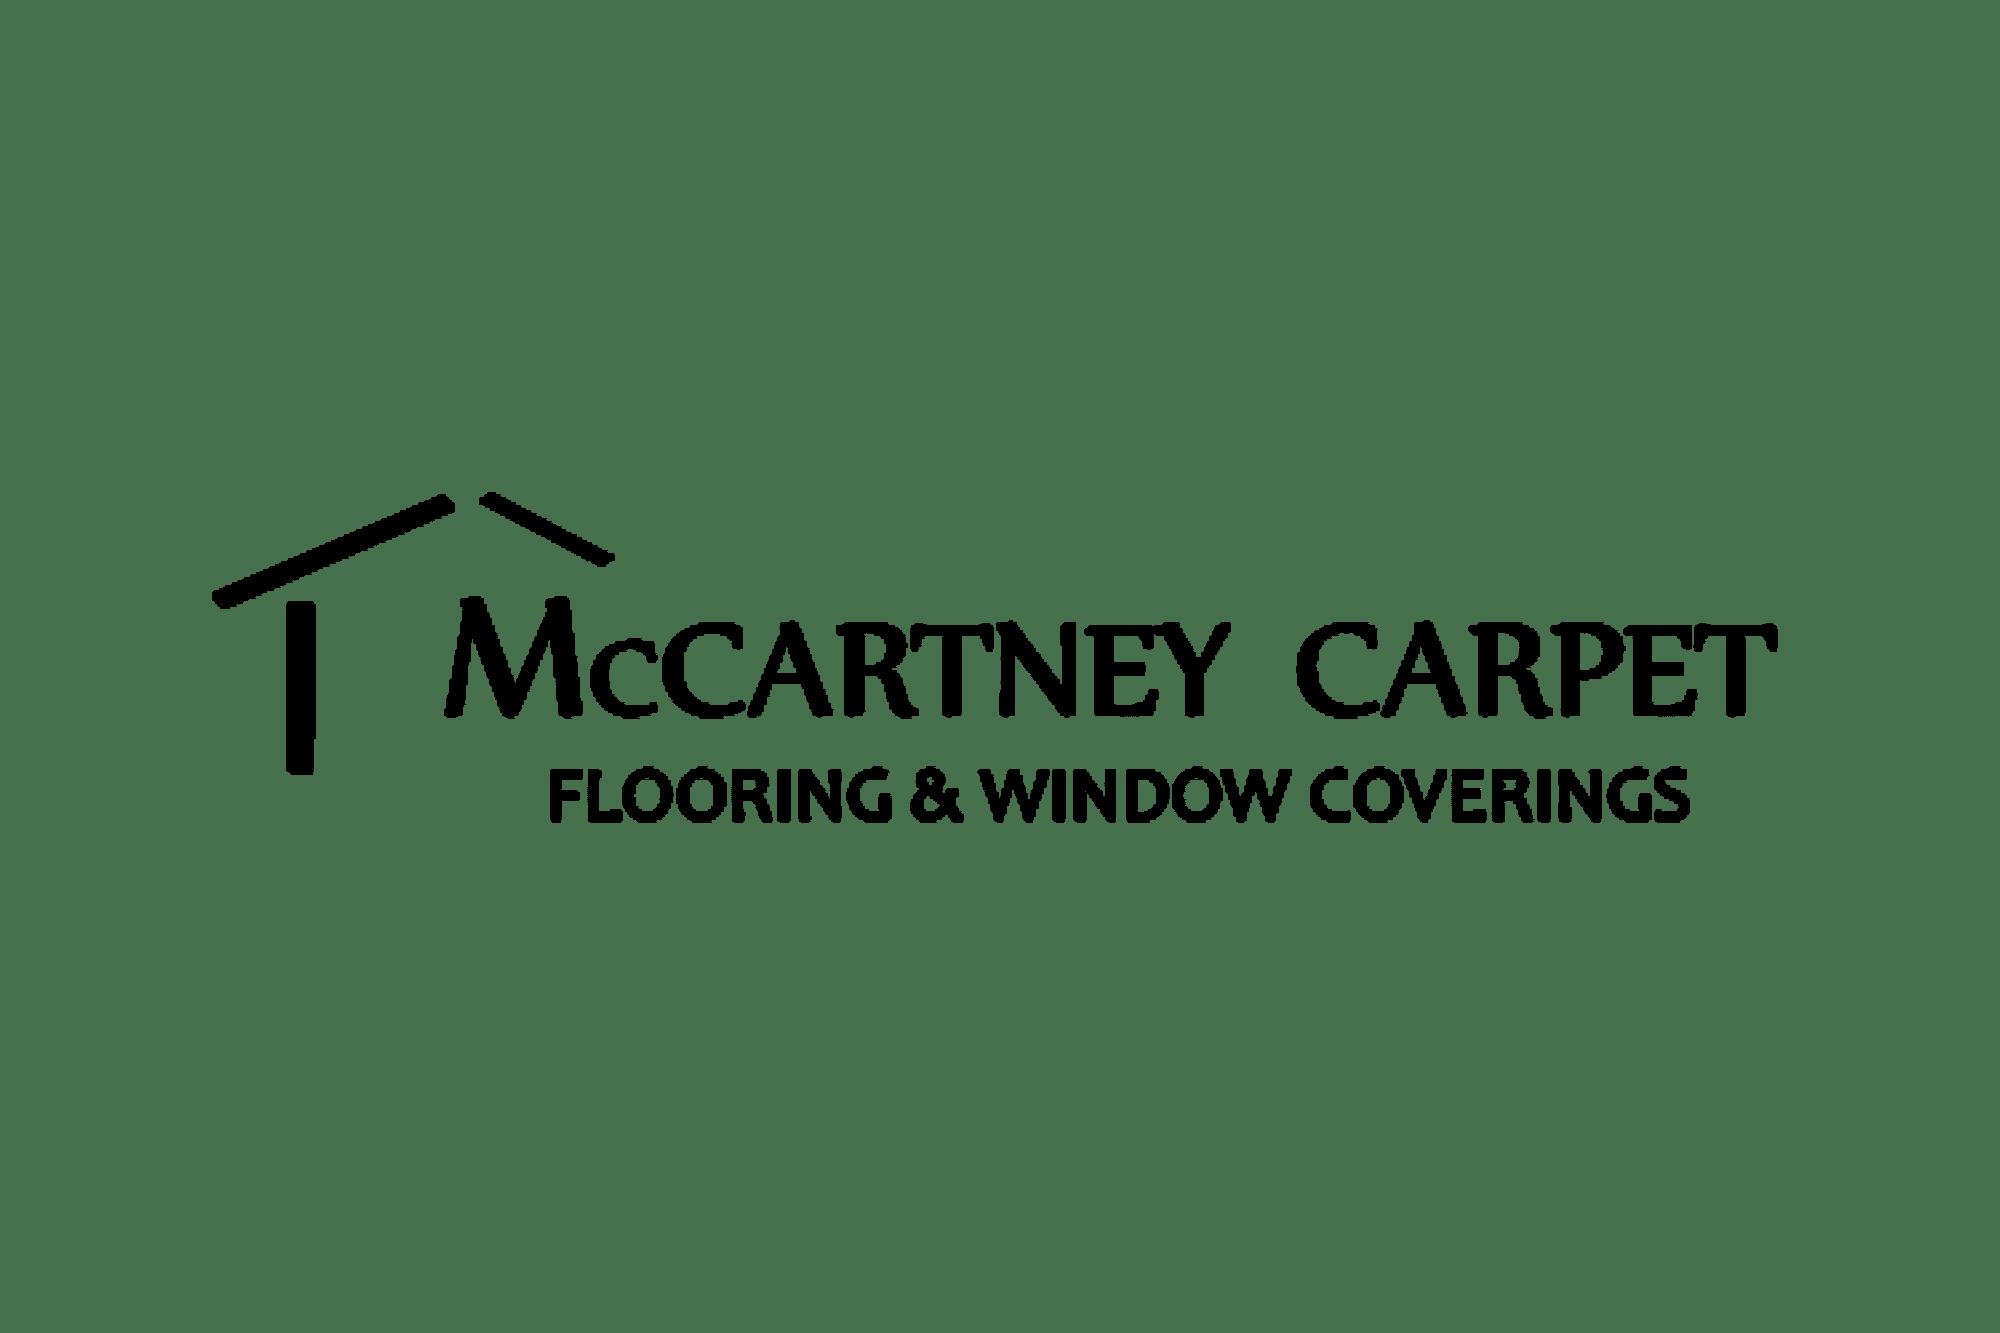 McCartney Carpet Inc. - 404 N Main St Westfield, WI 53964